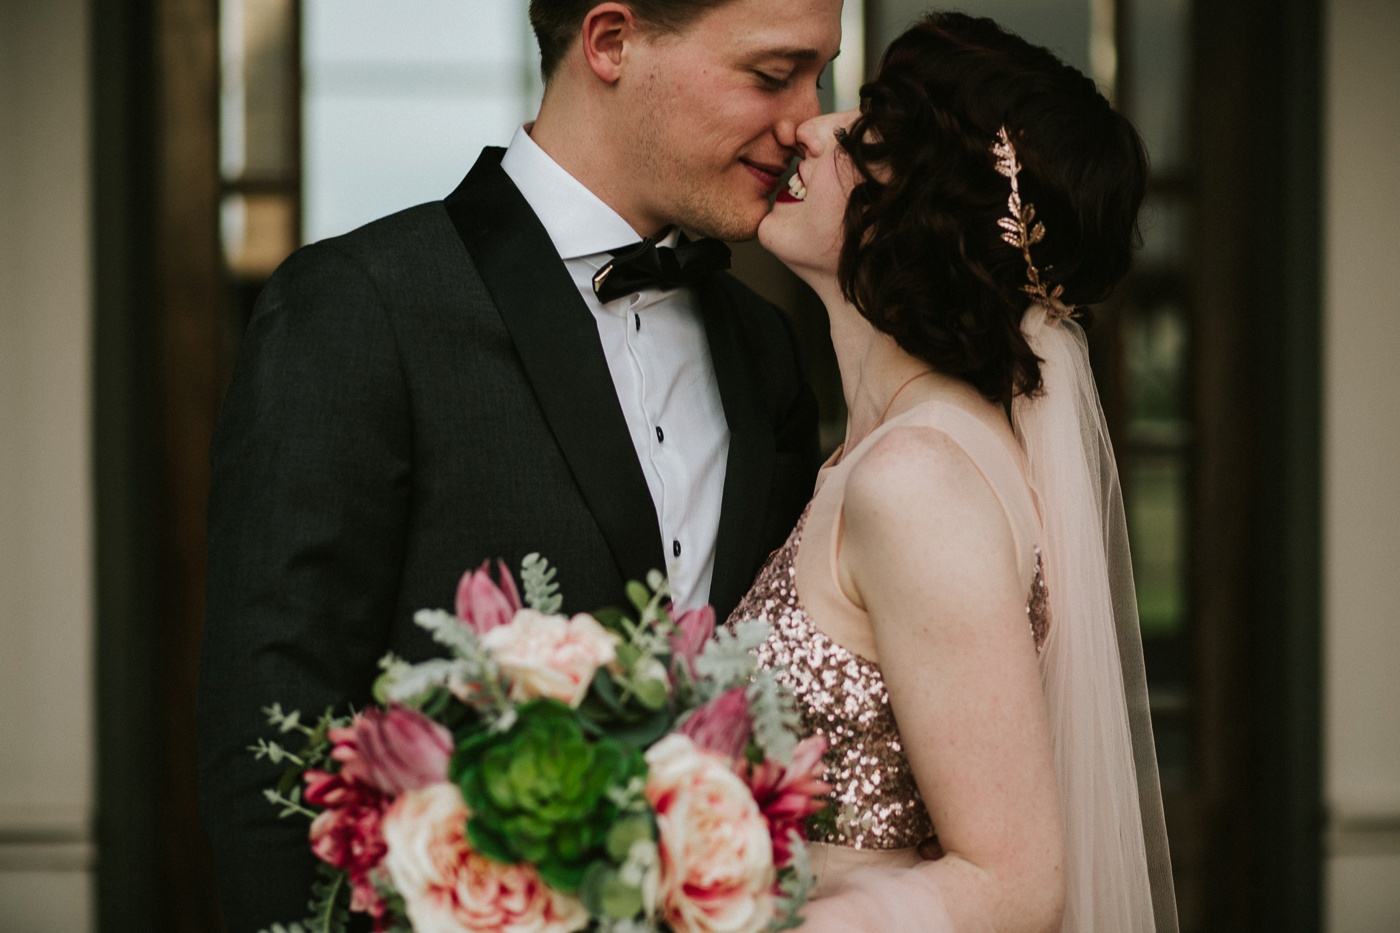 Emma&Morgan_Melbourne-Vintage-Elegant-Fun-Quirky-Yarra-Valley-Vineyard-Wedding_Melbourne-Wedding-Photography-60